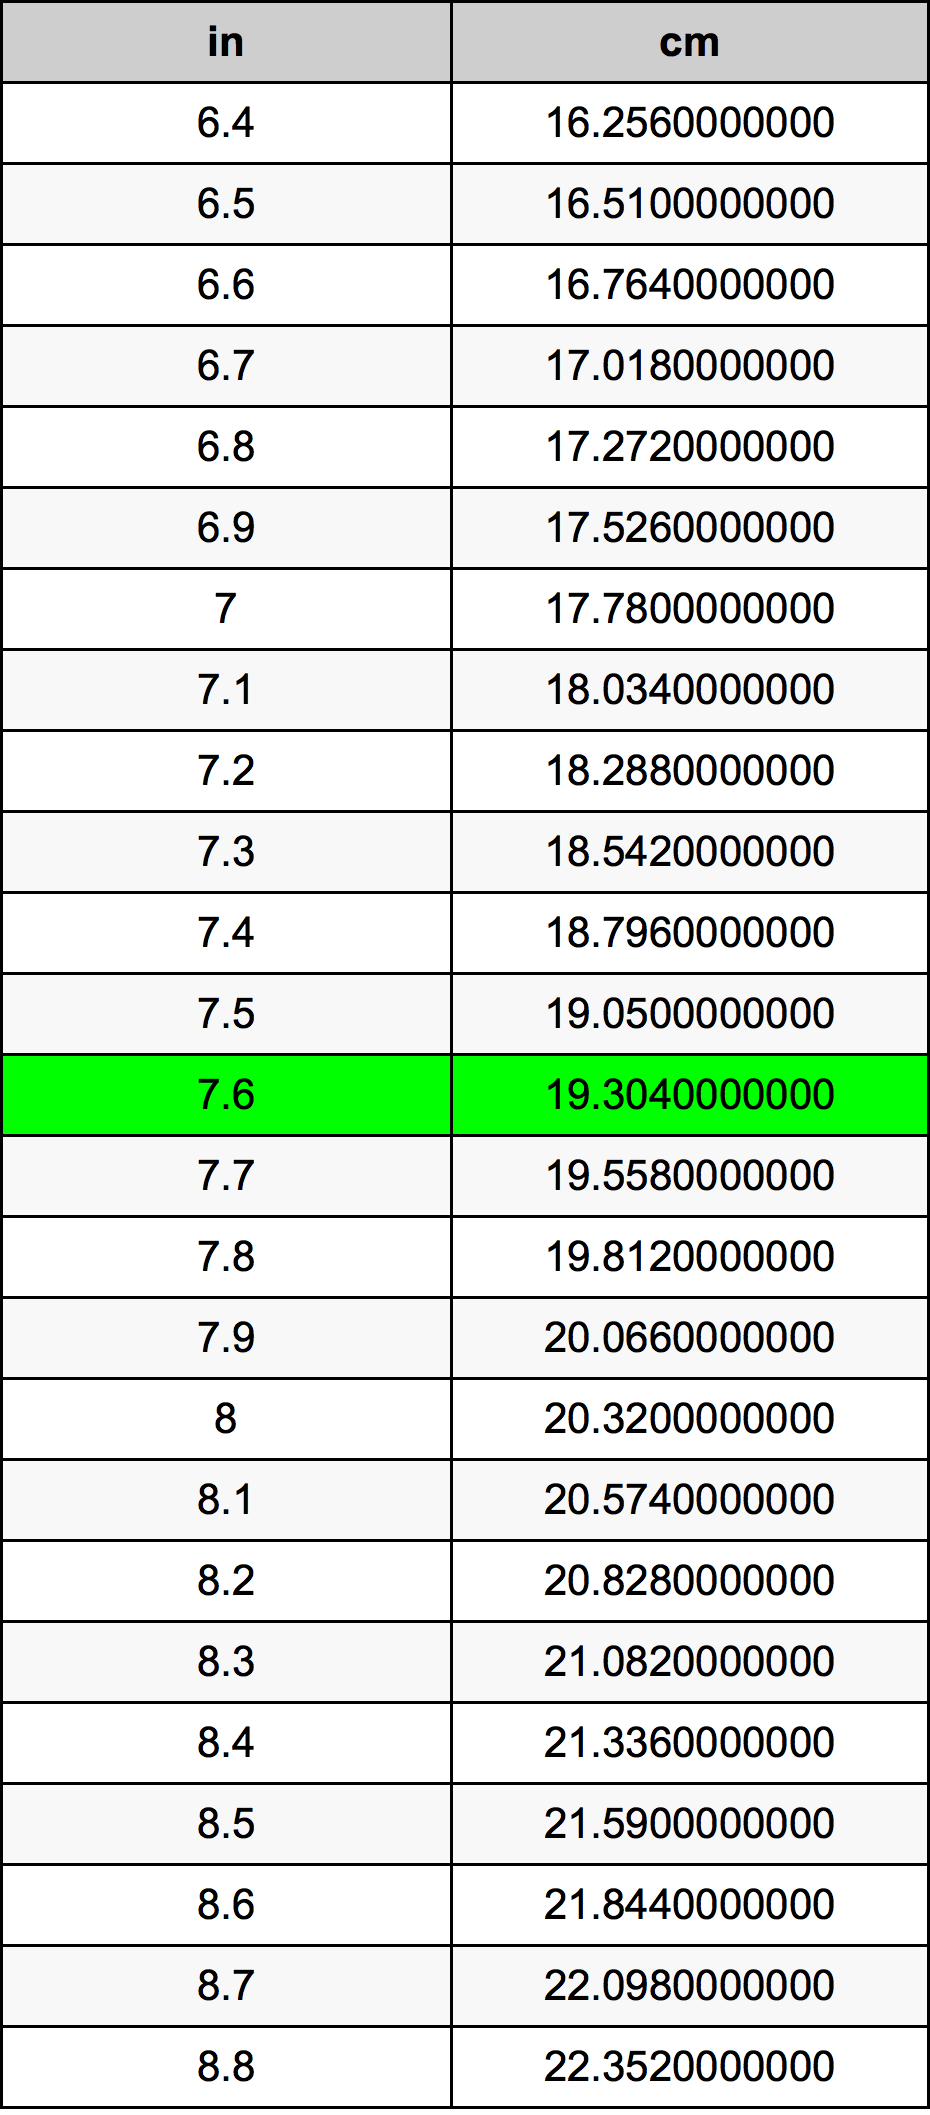 7 6 Pulgadas En Centímetros Conversor De Unidades 7 6 In En Cm Conversor De Unidades